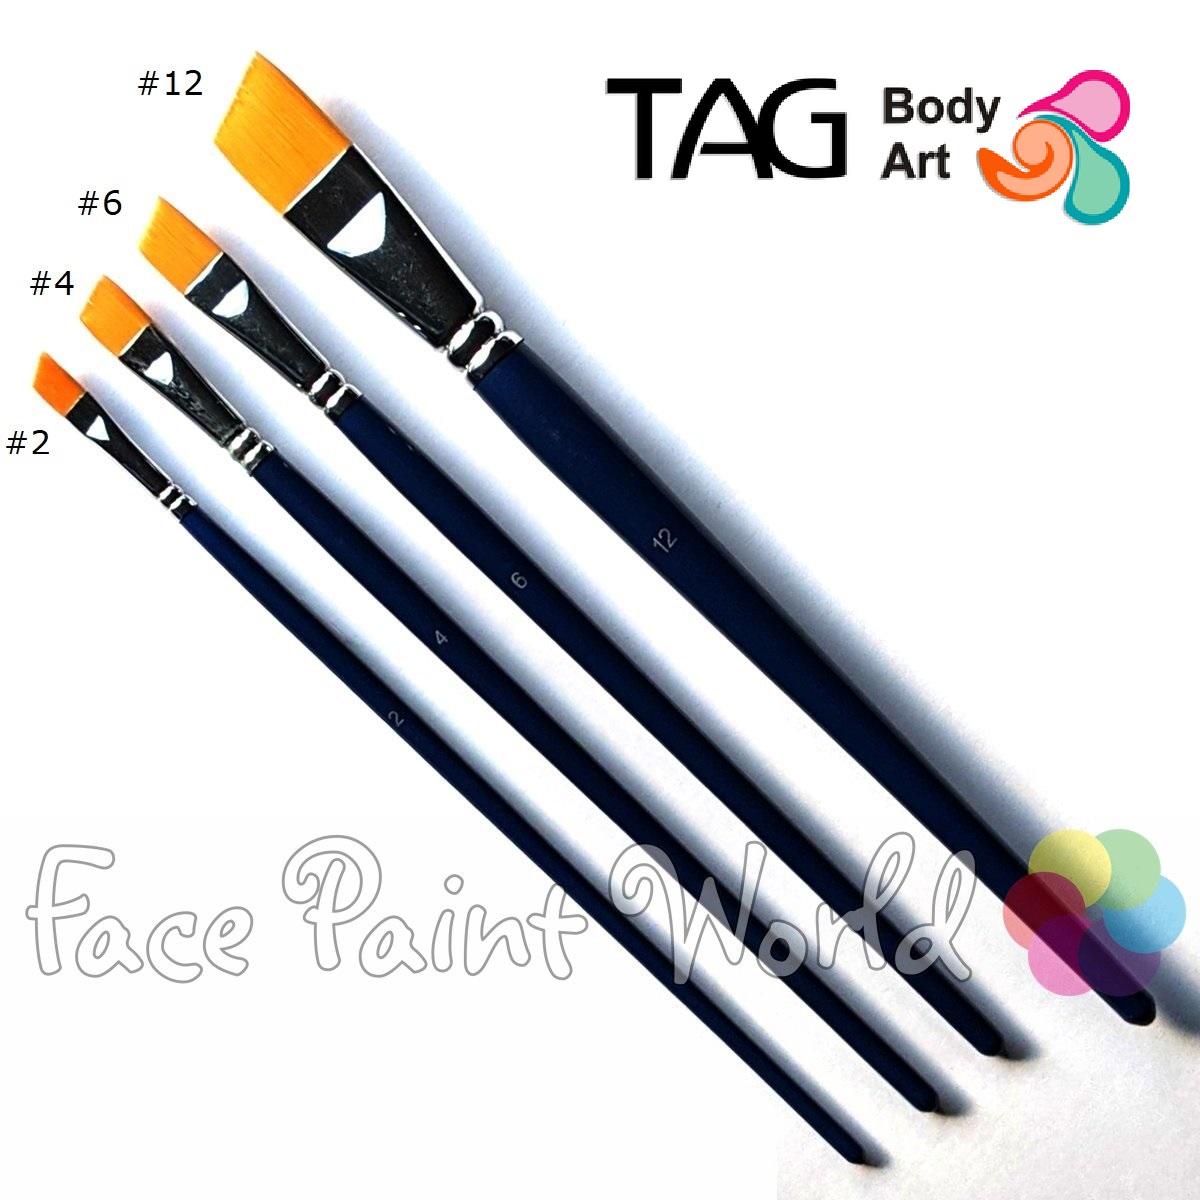 TAG Angular Shader Brush #06 : 1/2 inch